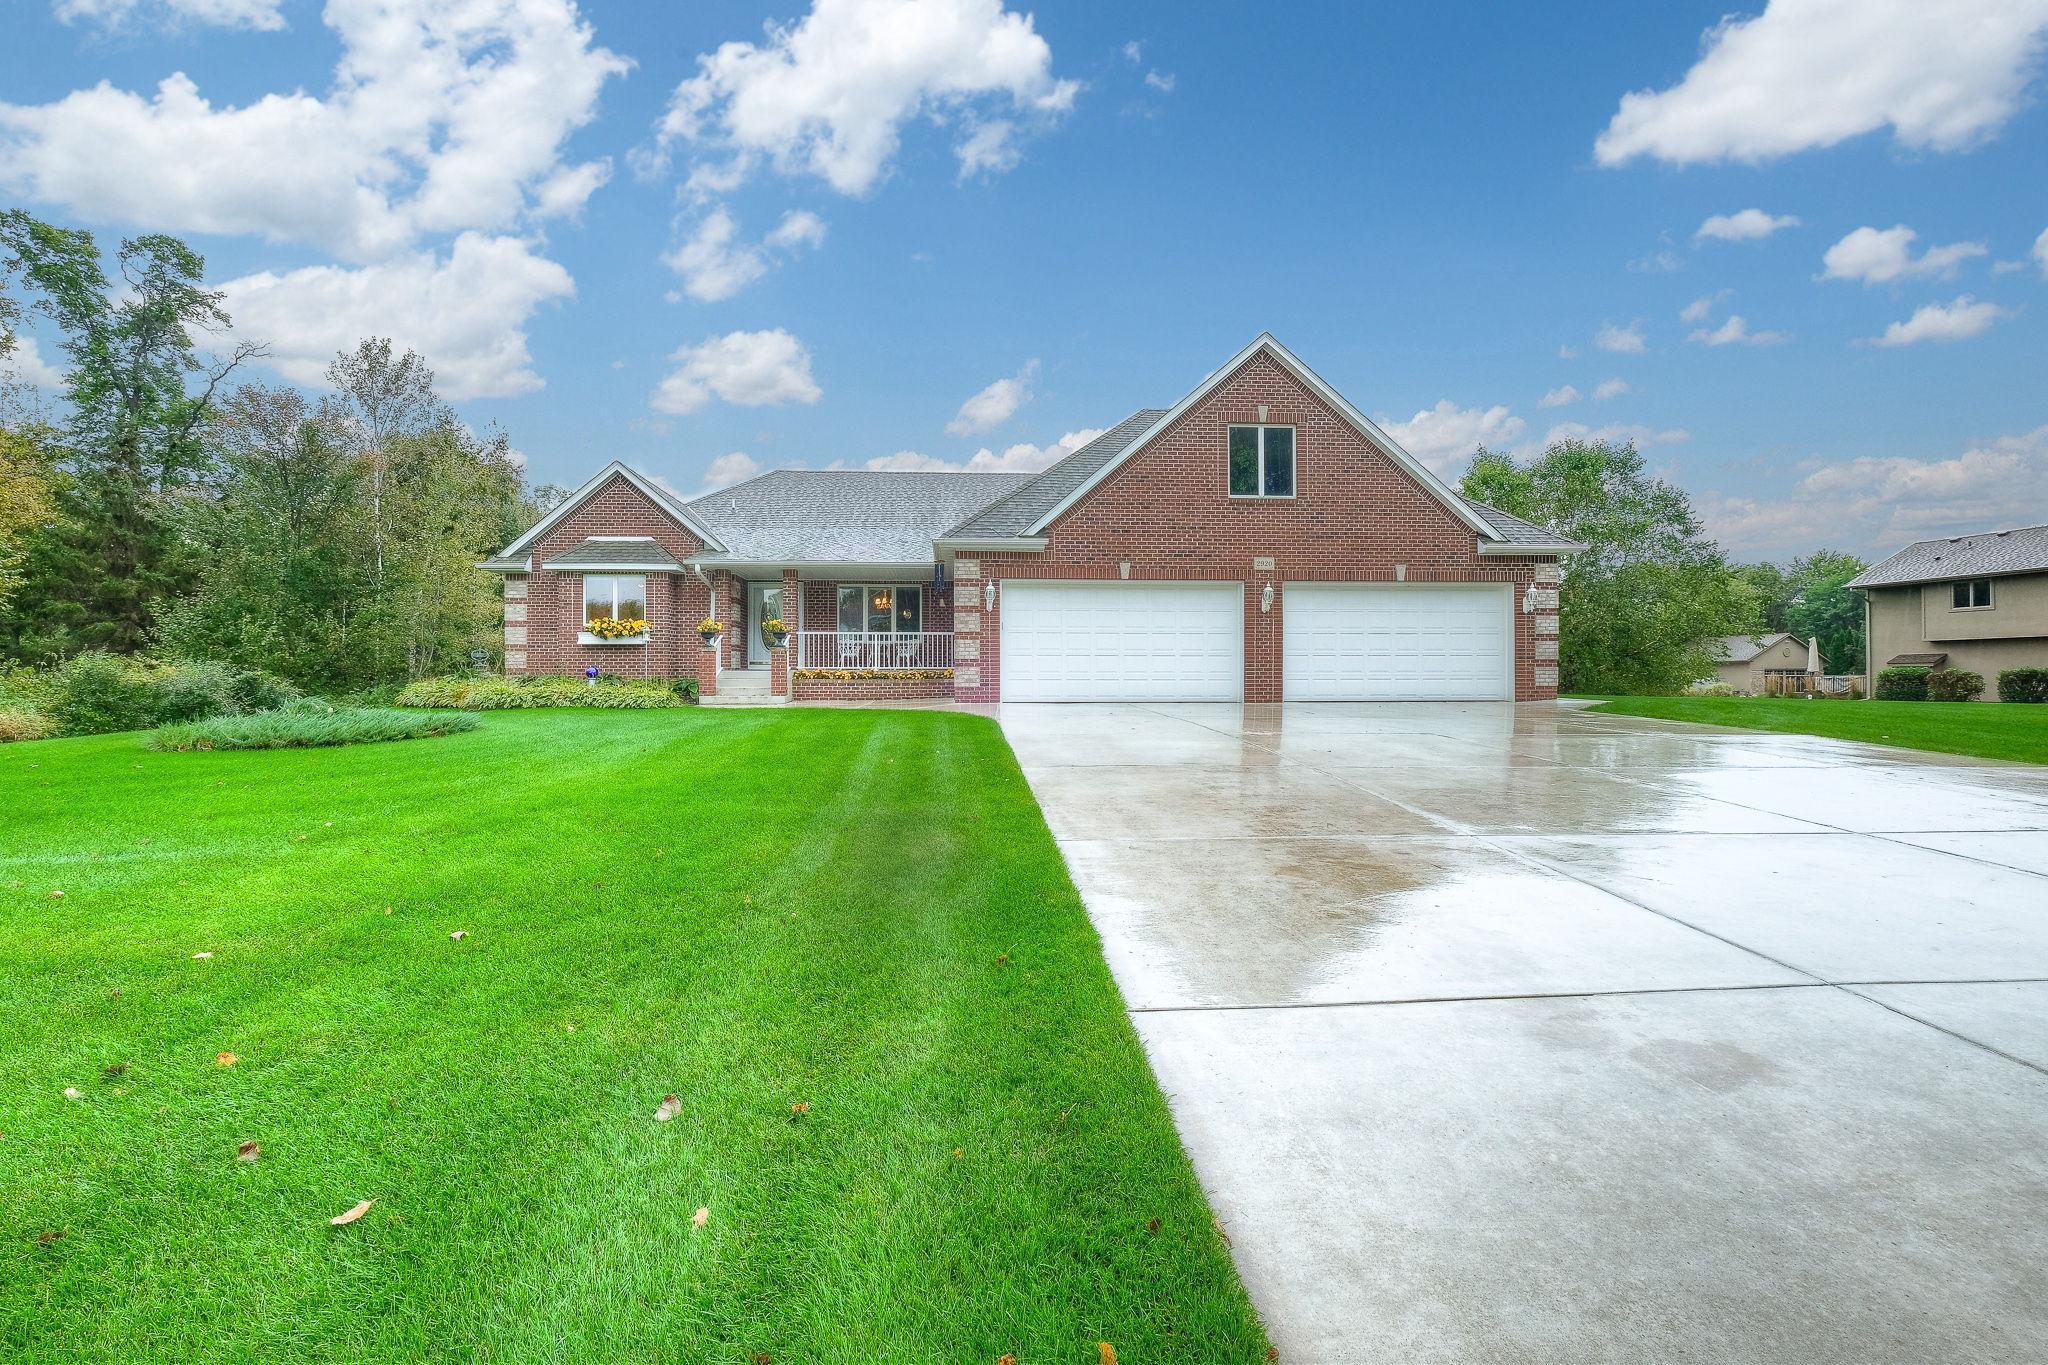 2920 144th Avenue NE Property Photo - Ham Lake, MN real estate listing